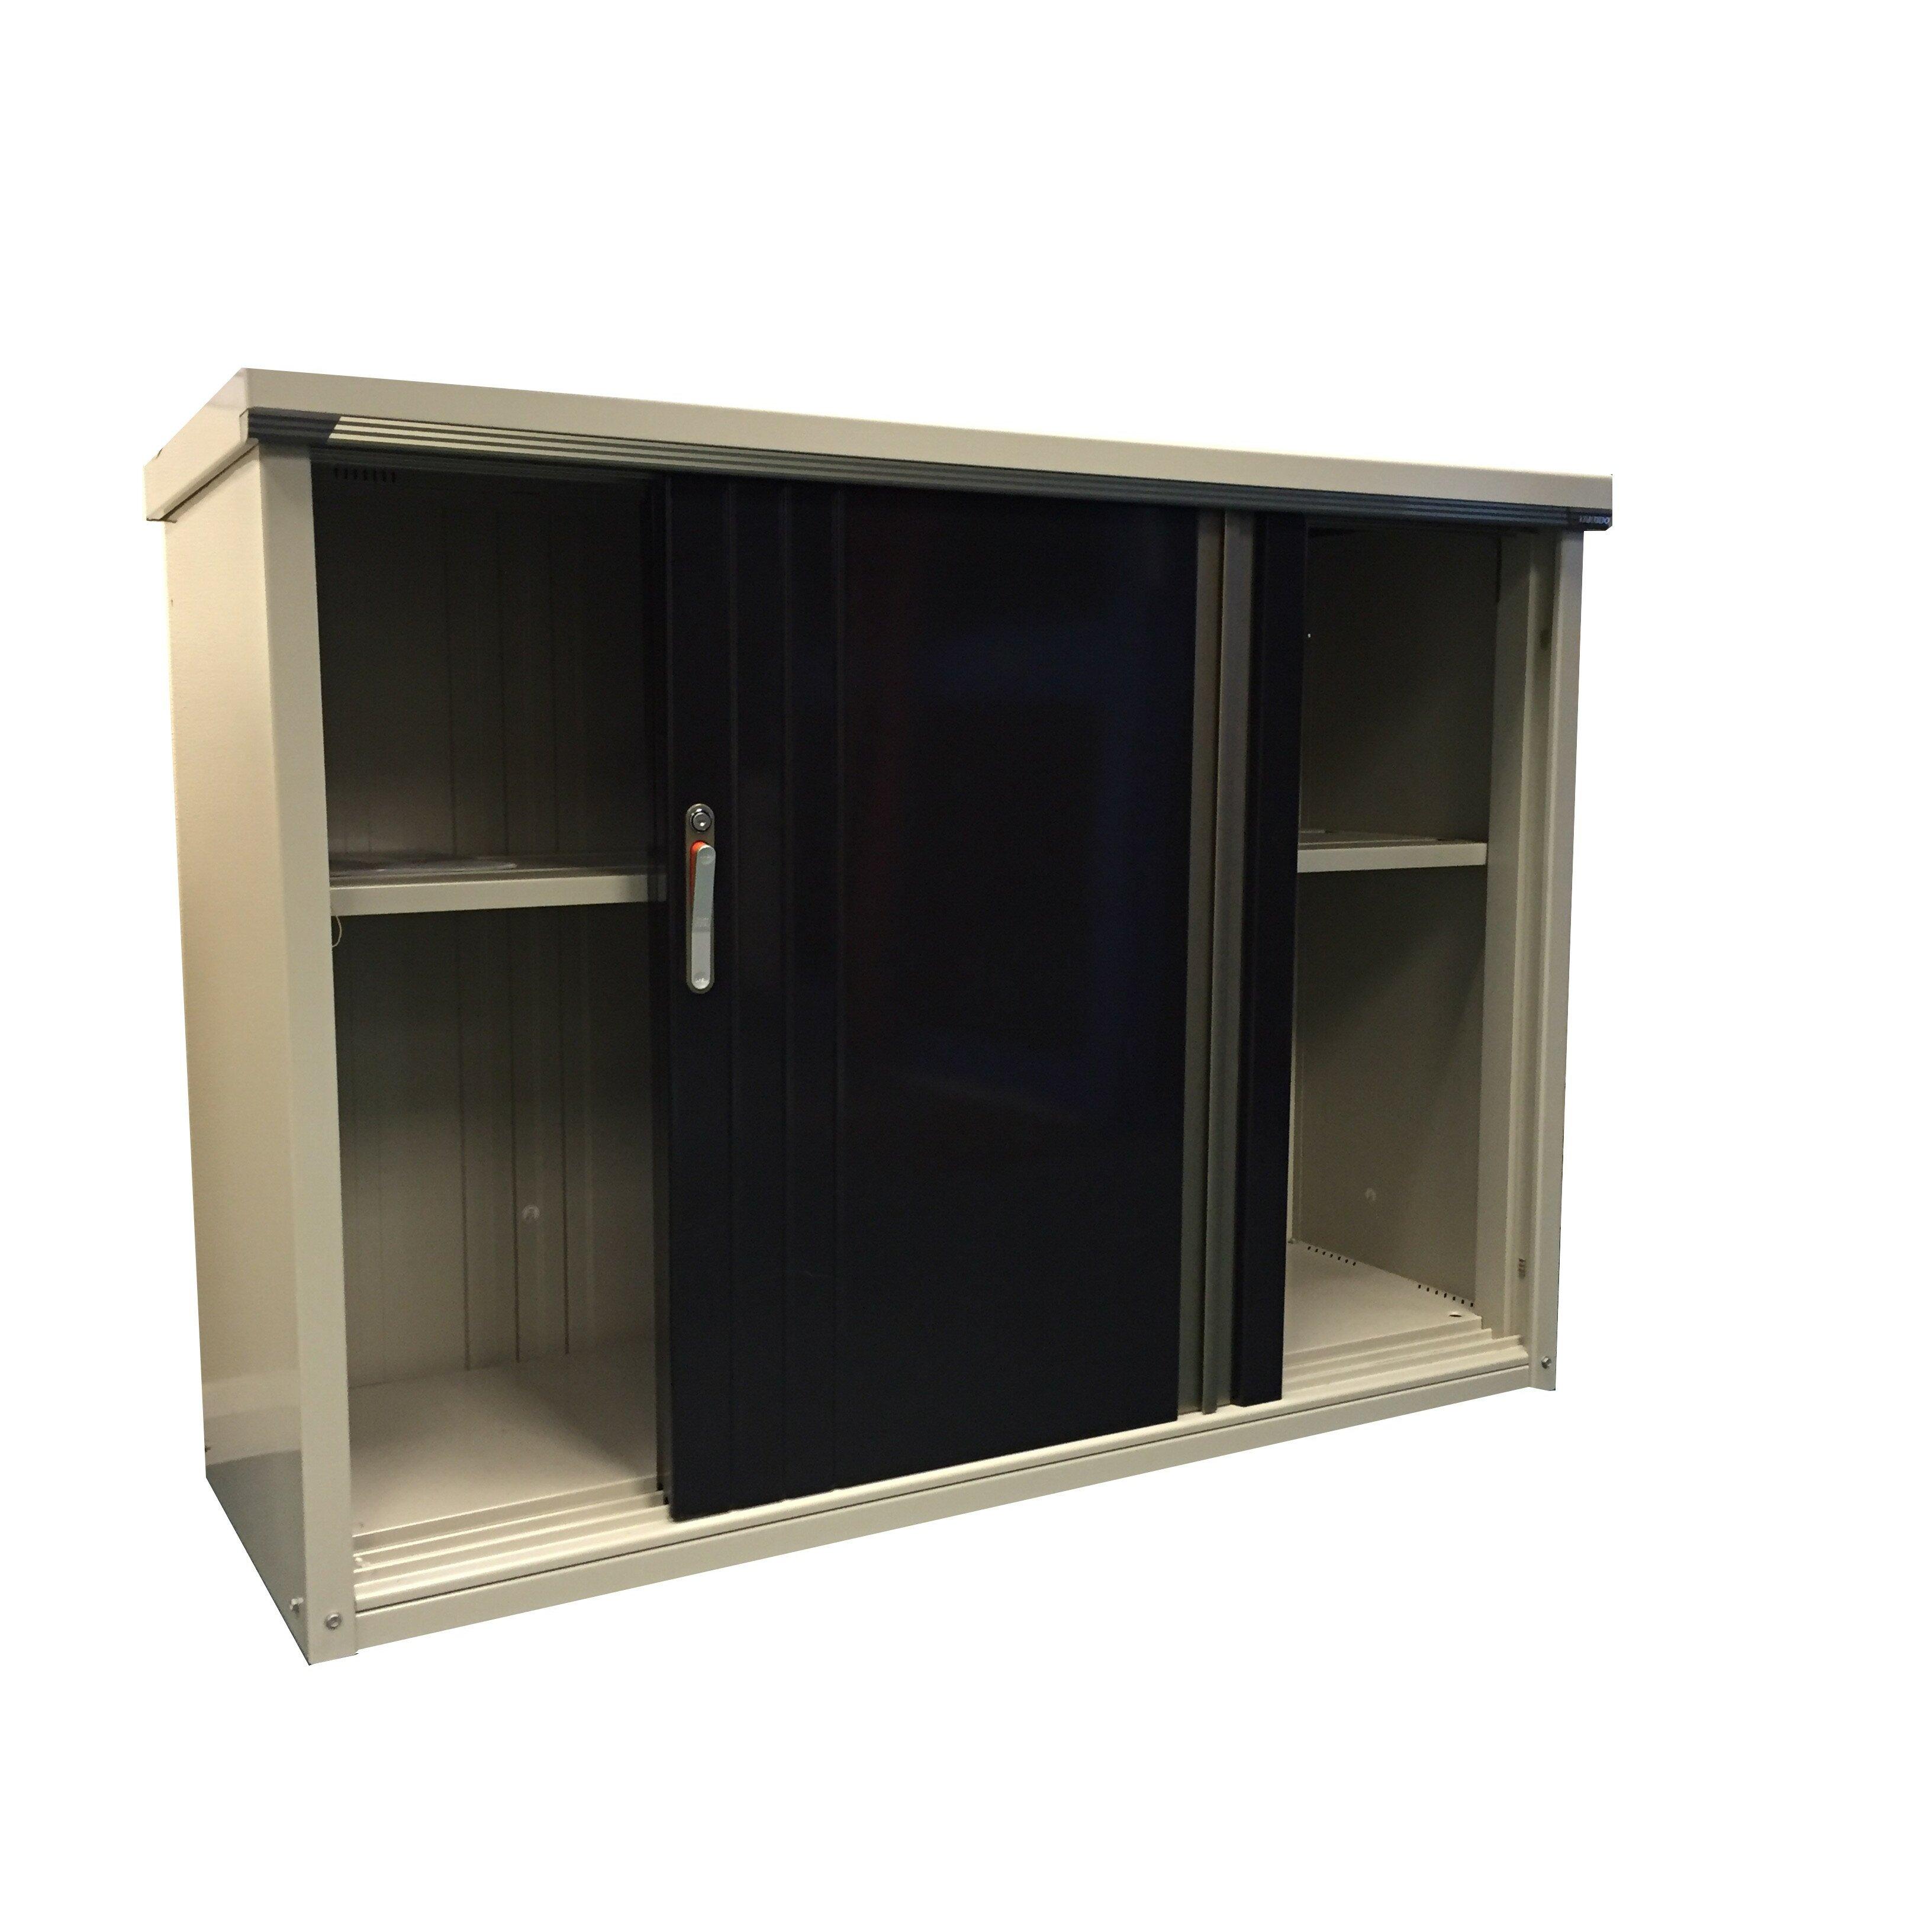 Store more takubo 5 x 2 metal storage shed wayfair uk for Wayfair store